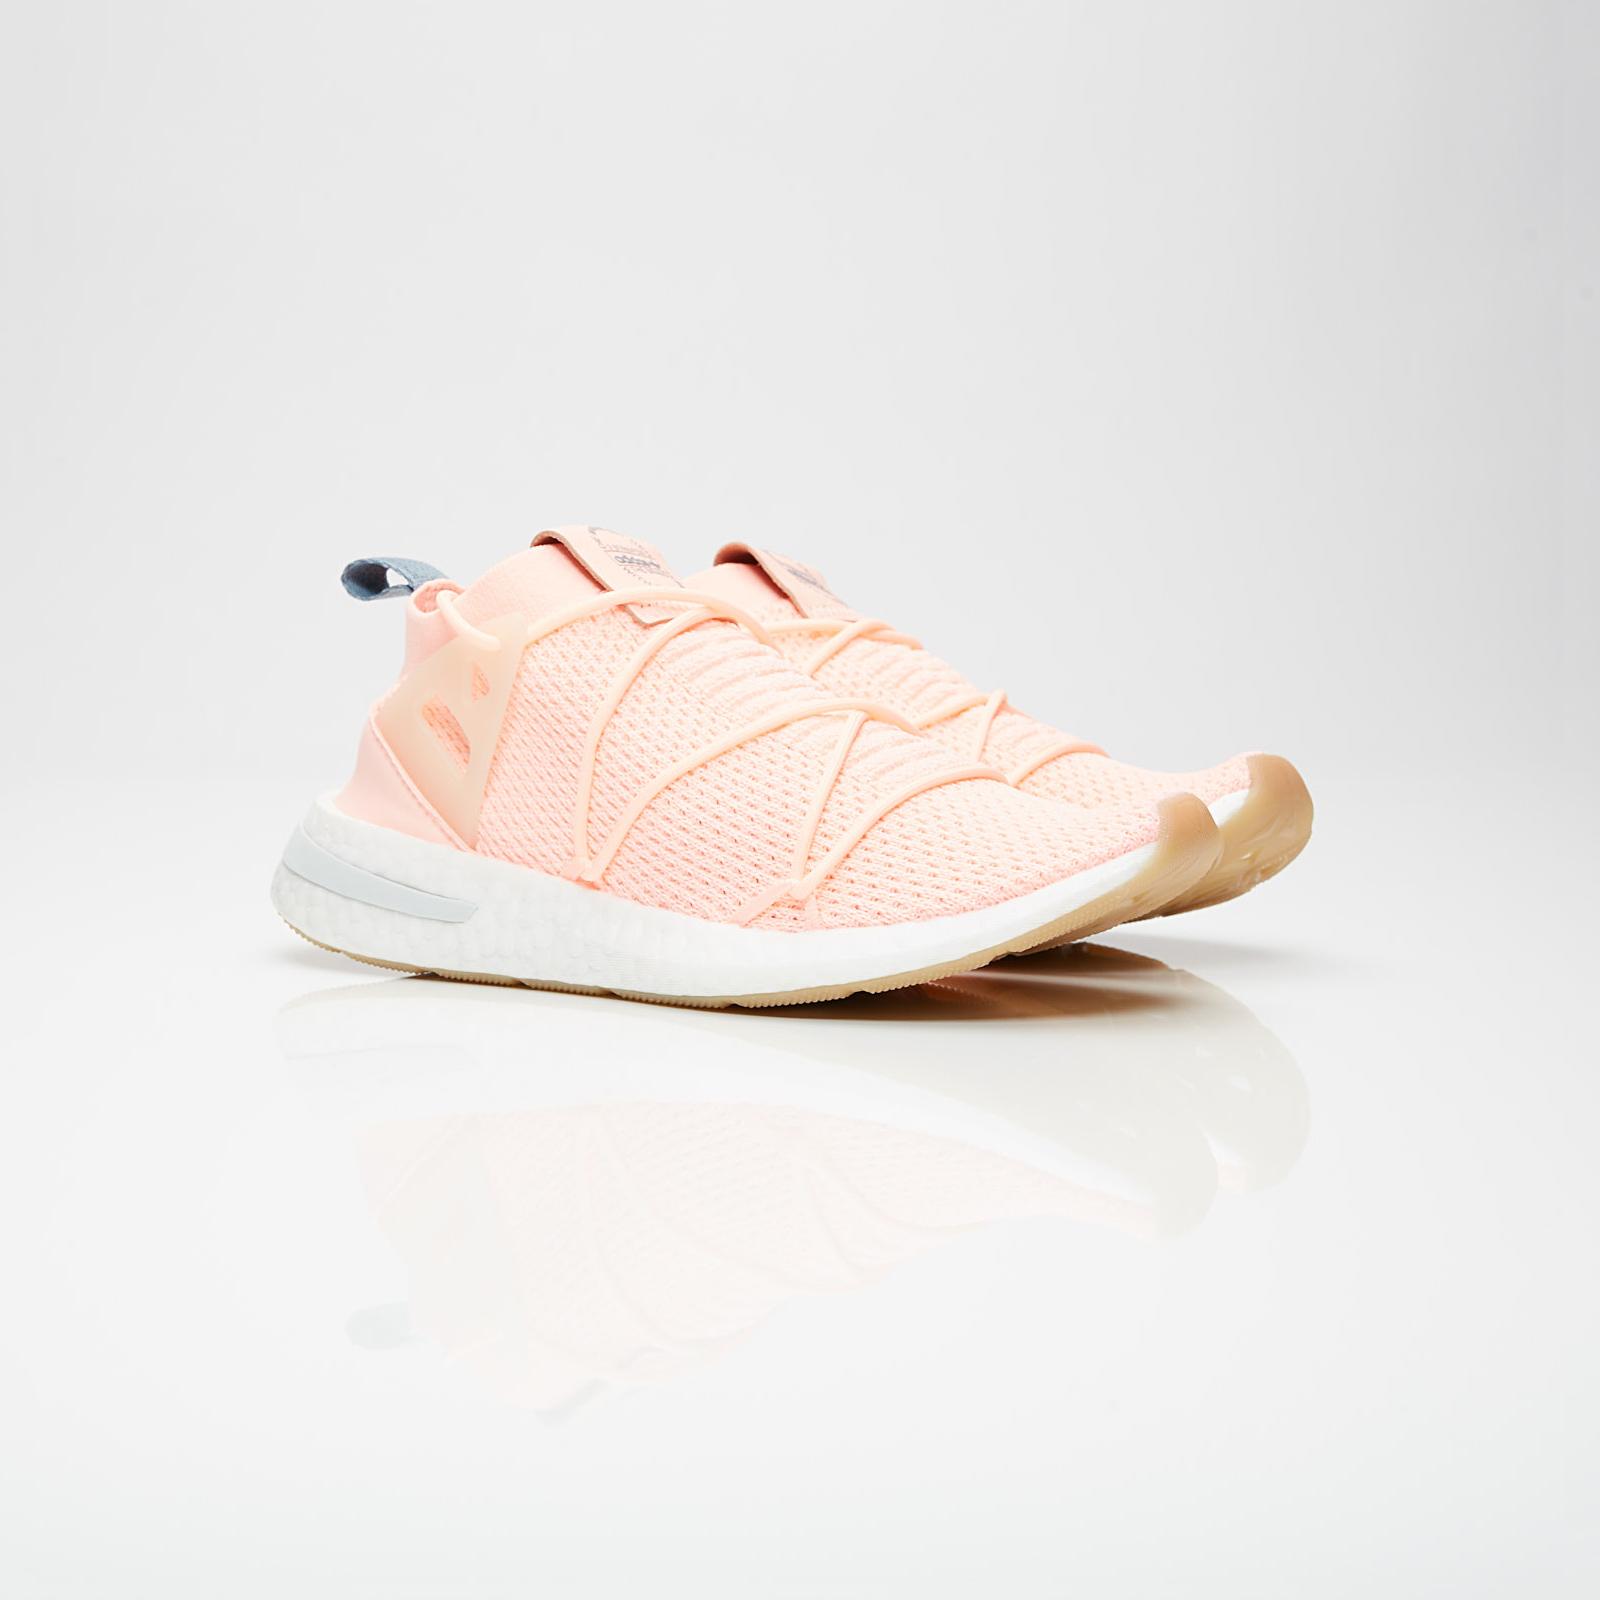 adidas Arkyn PK W - B96508 - Sneakersnstuff  6e5a56dbe